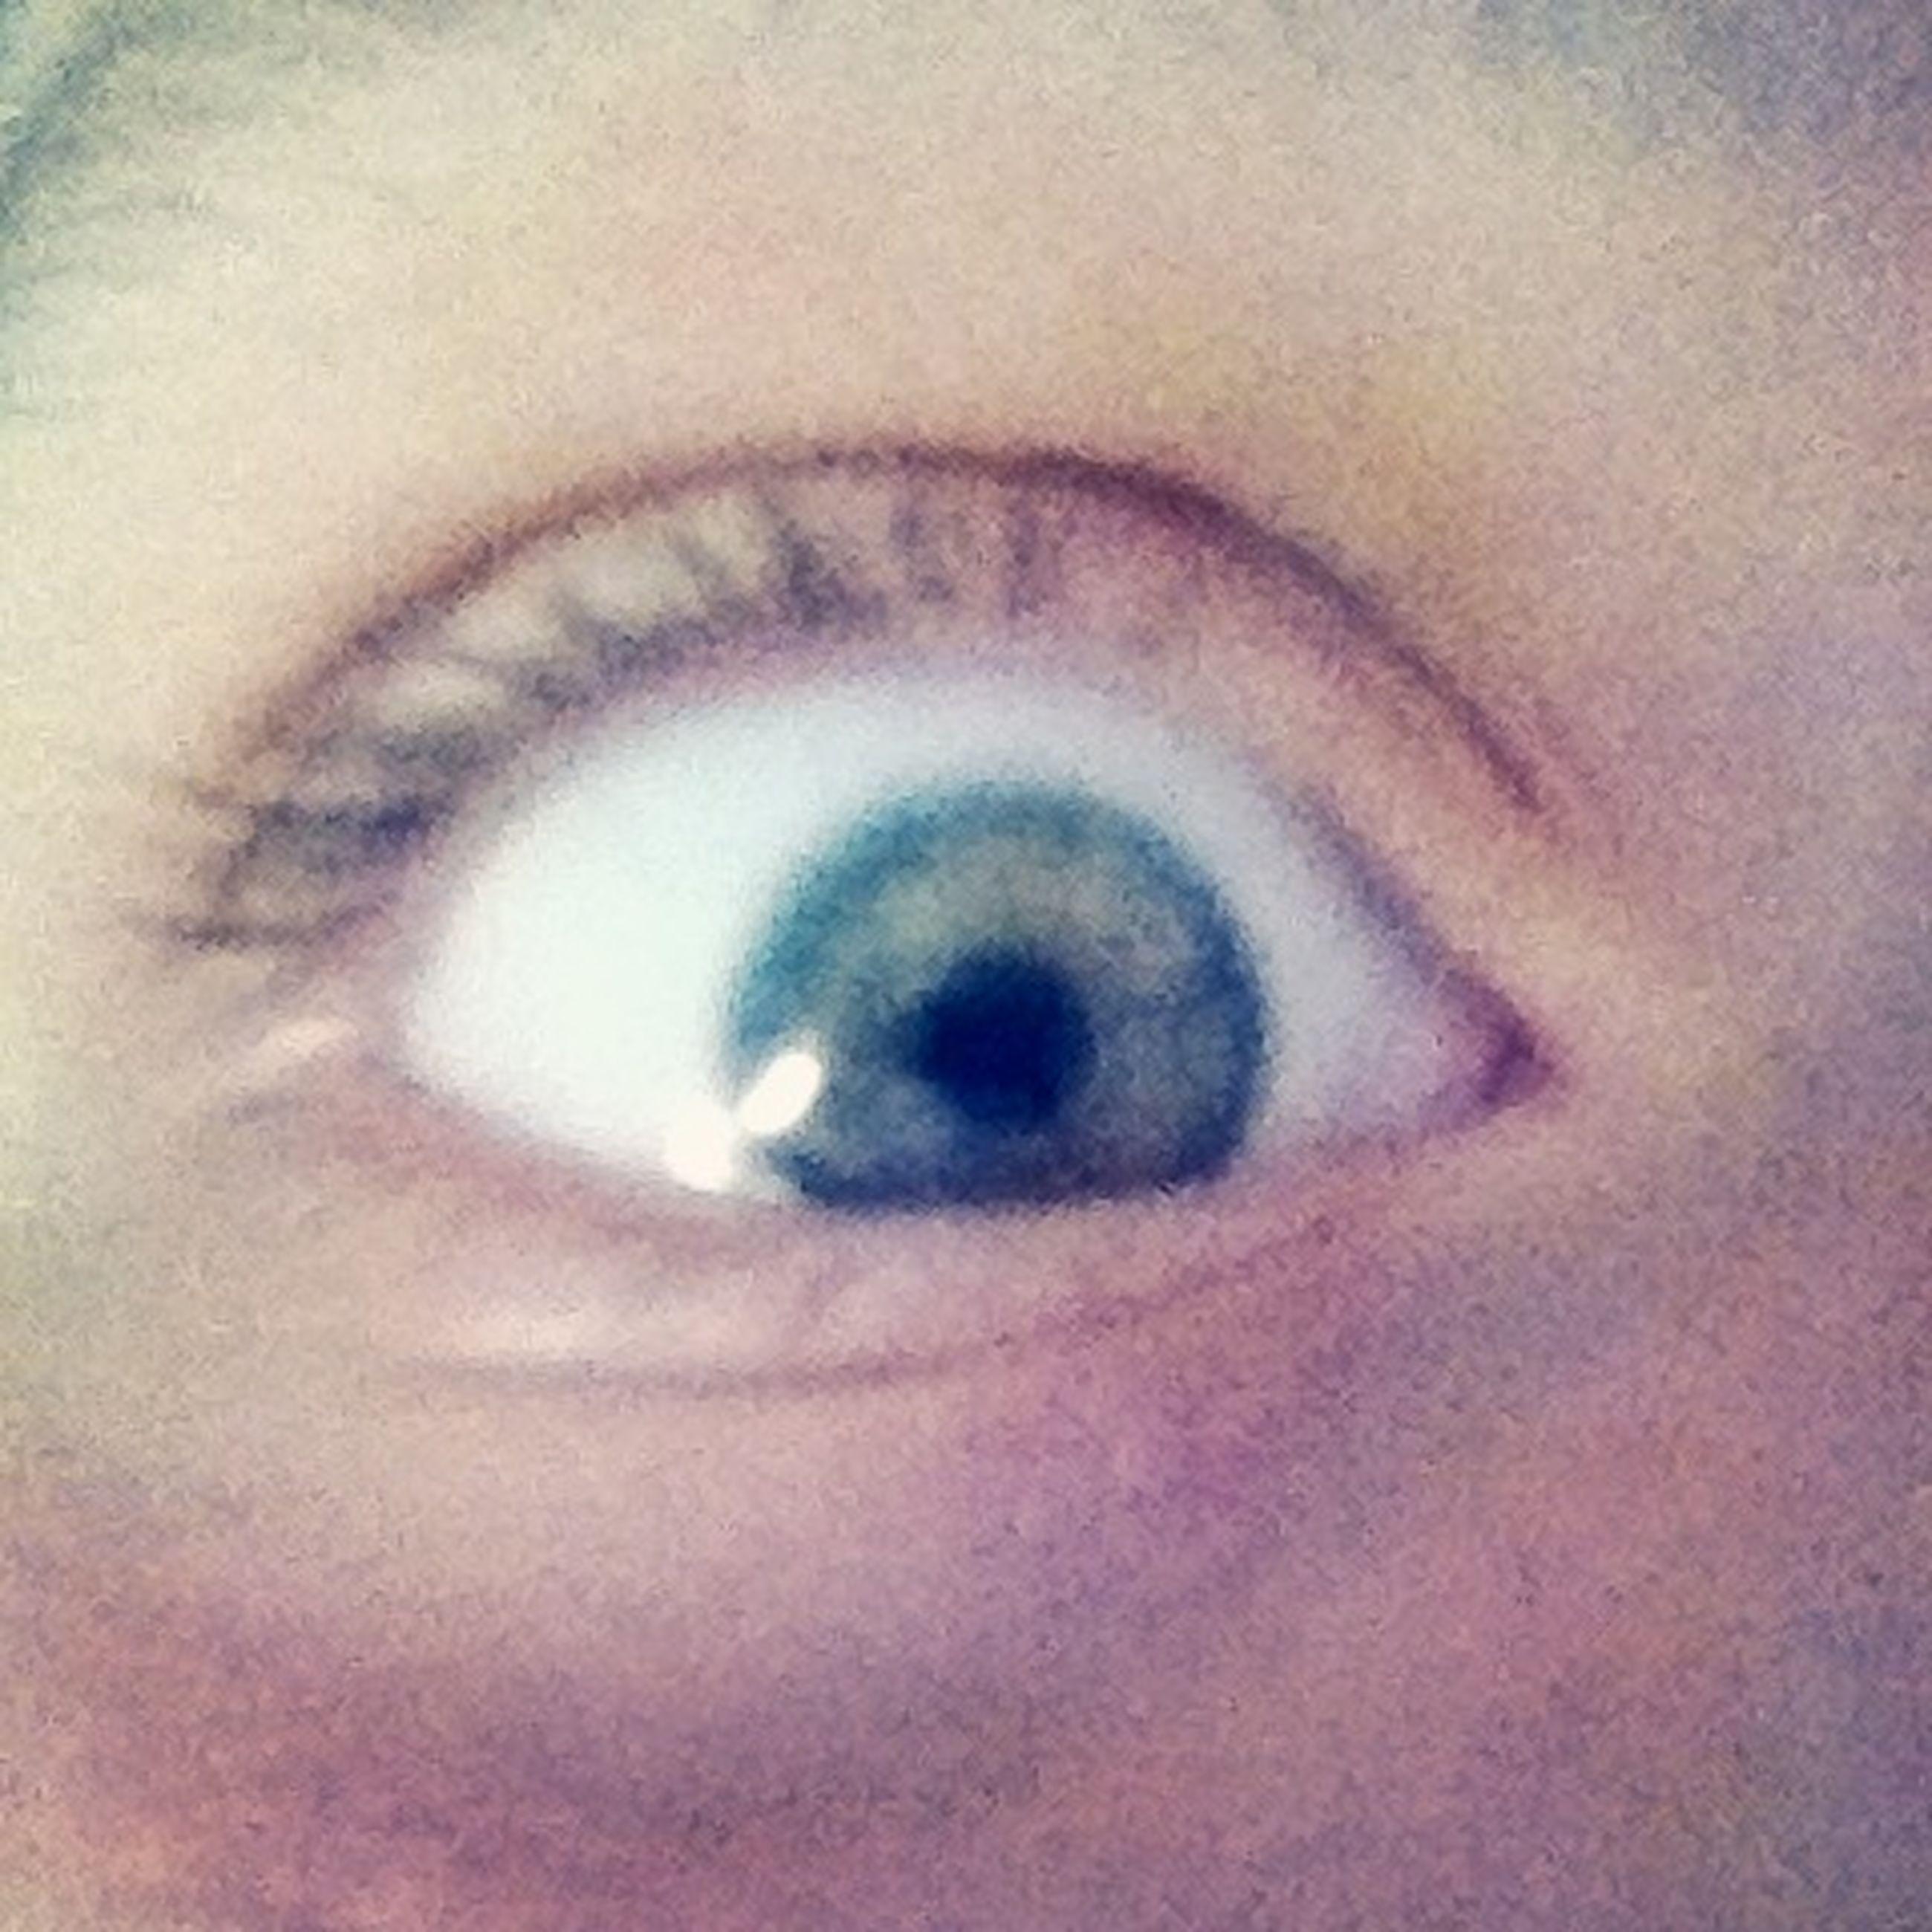 human eye, eyelash, close-up, eyesight, sensory perception, indoors, human skin, part of, extreme close-up, lifestyles, unrecognizable person, eyeball, looking at camera, iris - eye, human face, extreme close up, full frame